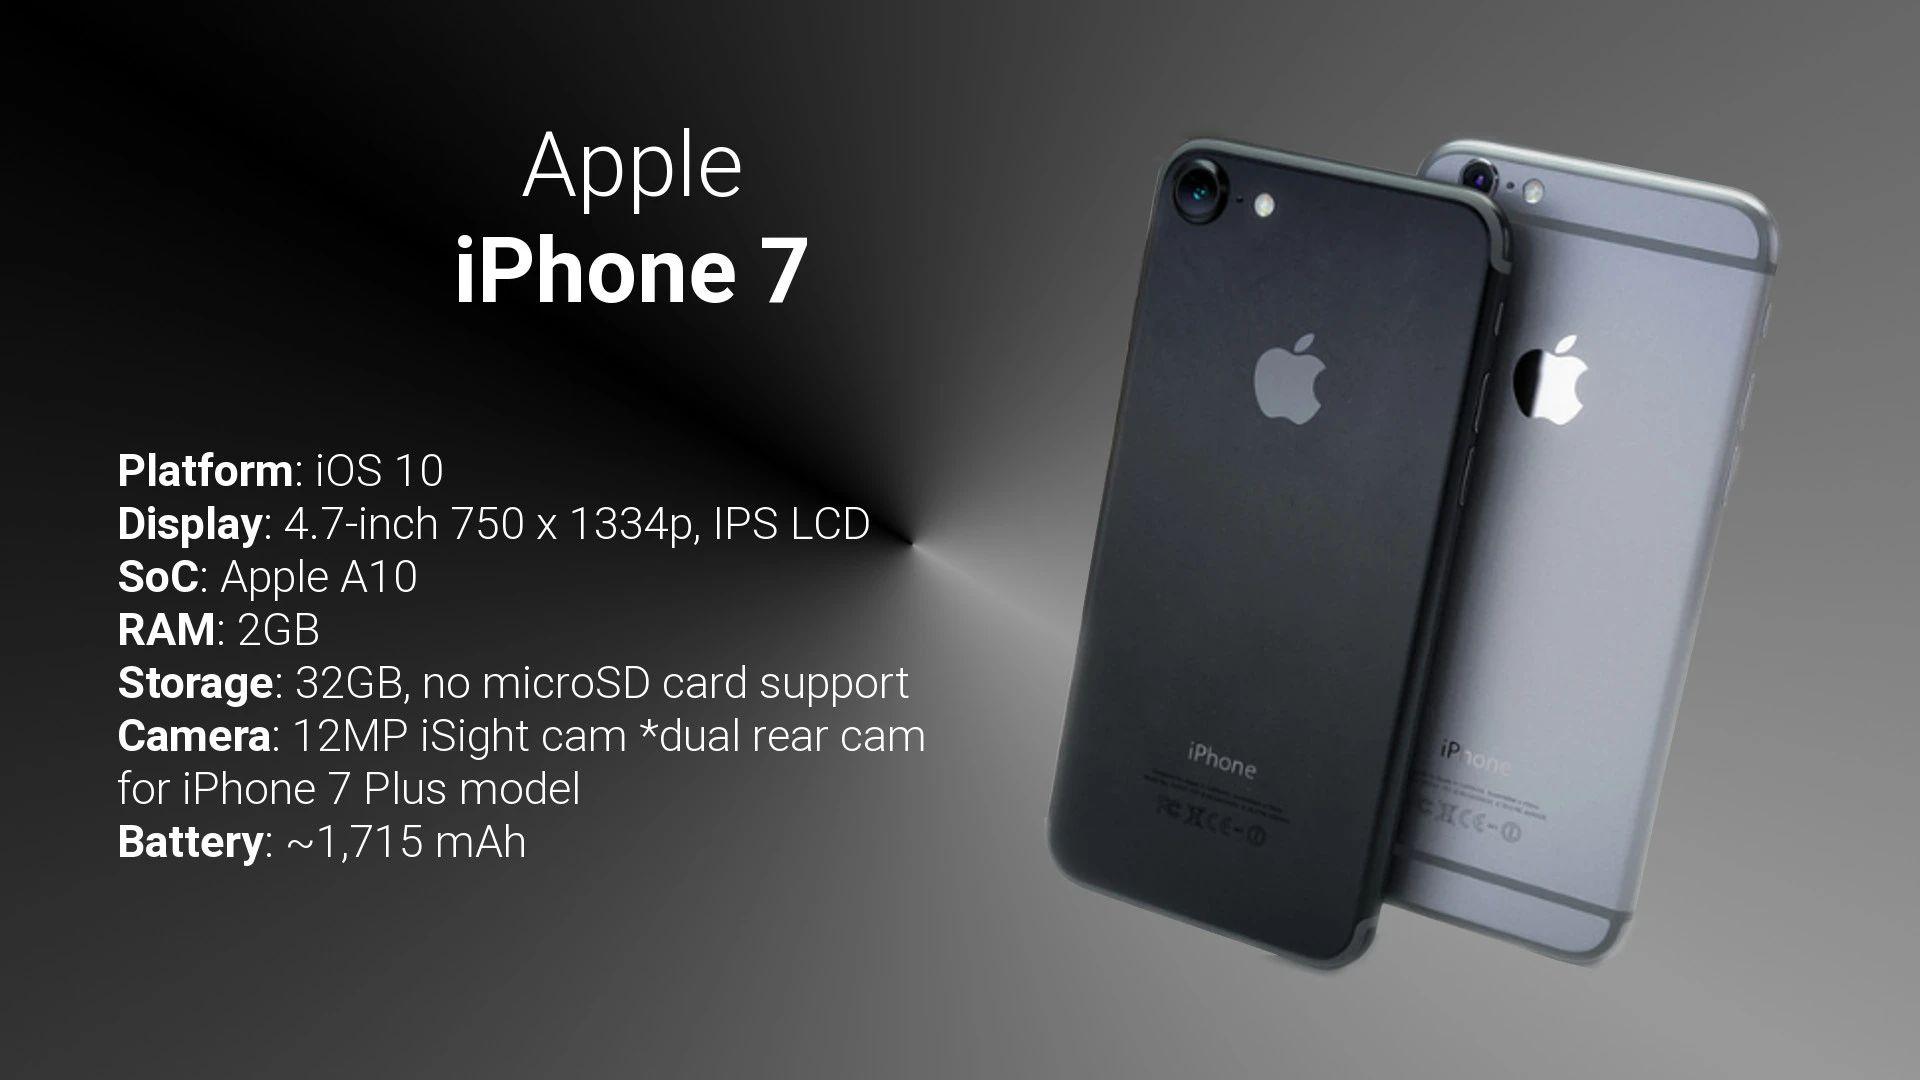 Samsung galaxy note 7 vs apple iphone 7 7 plus